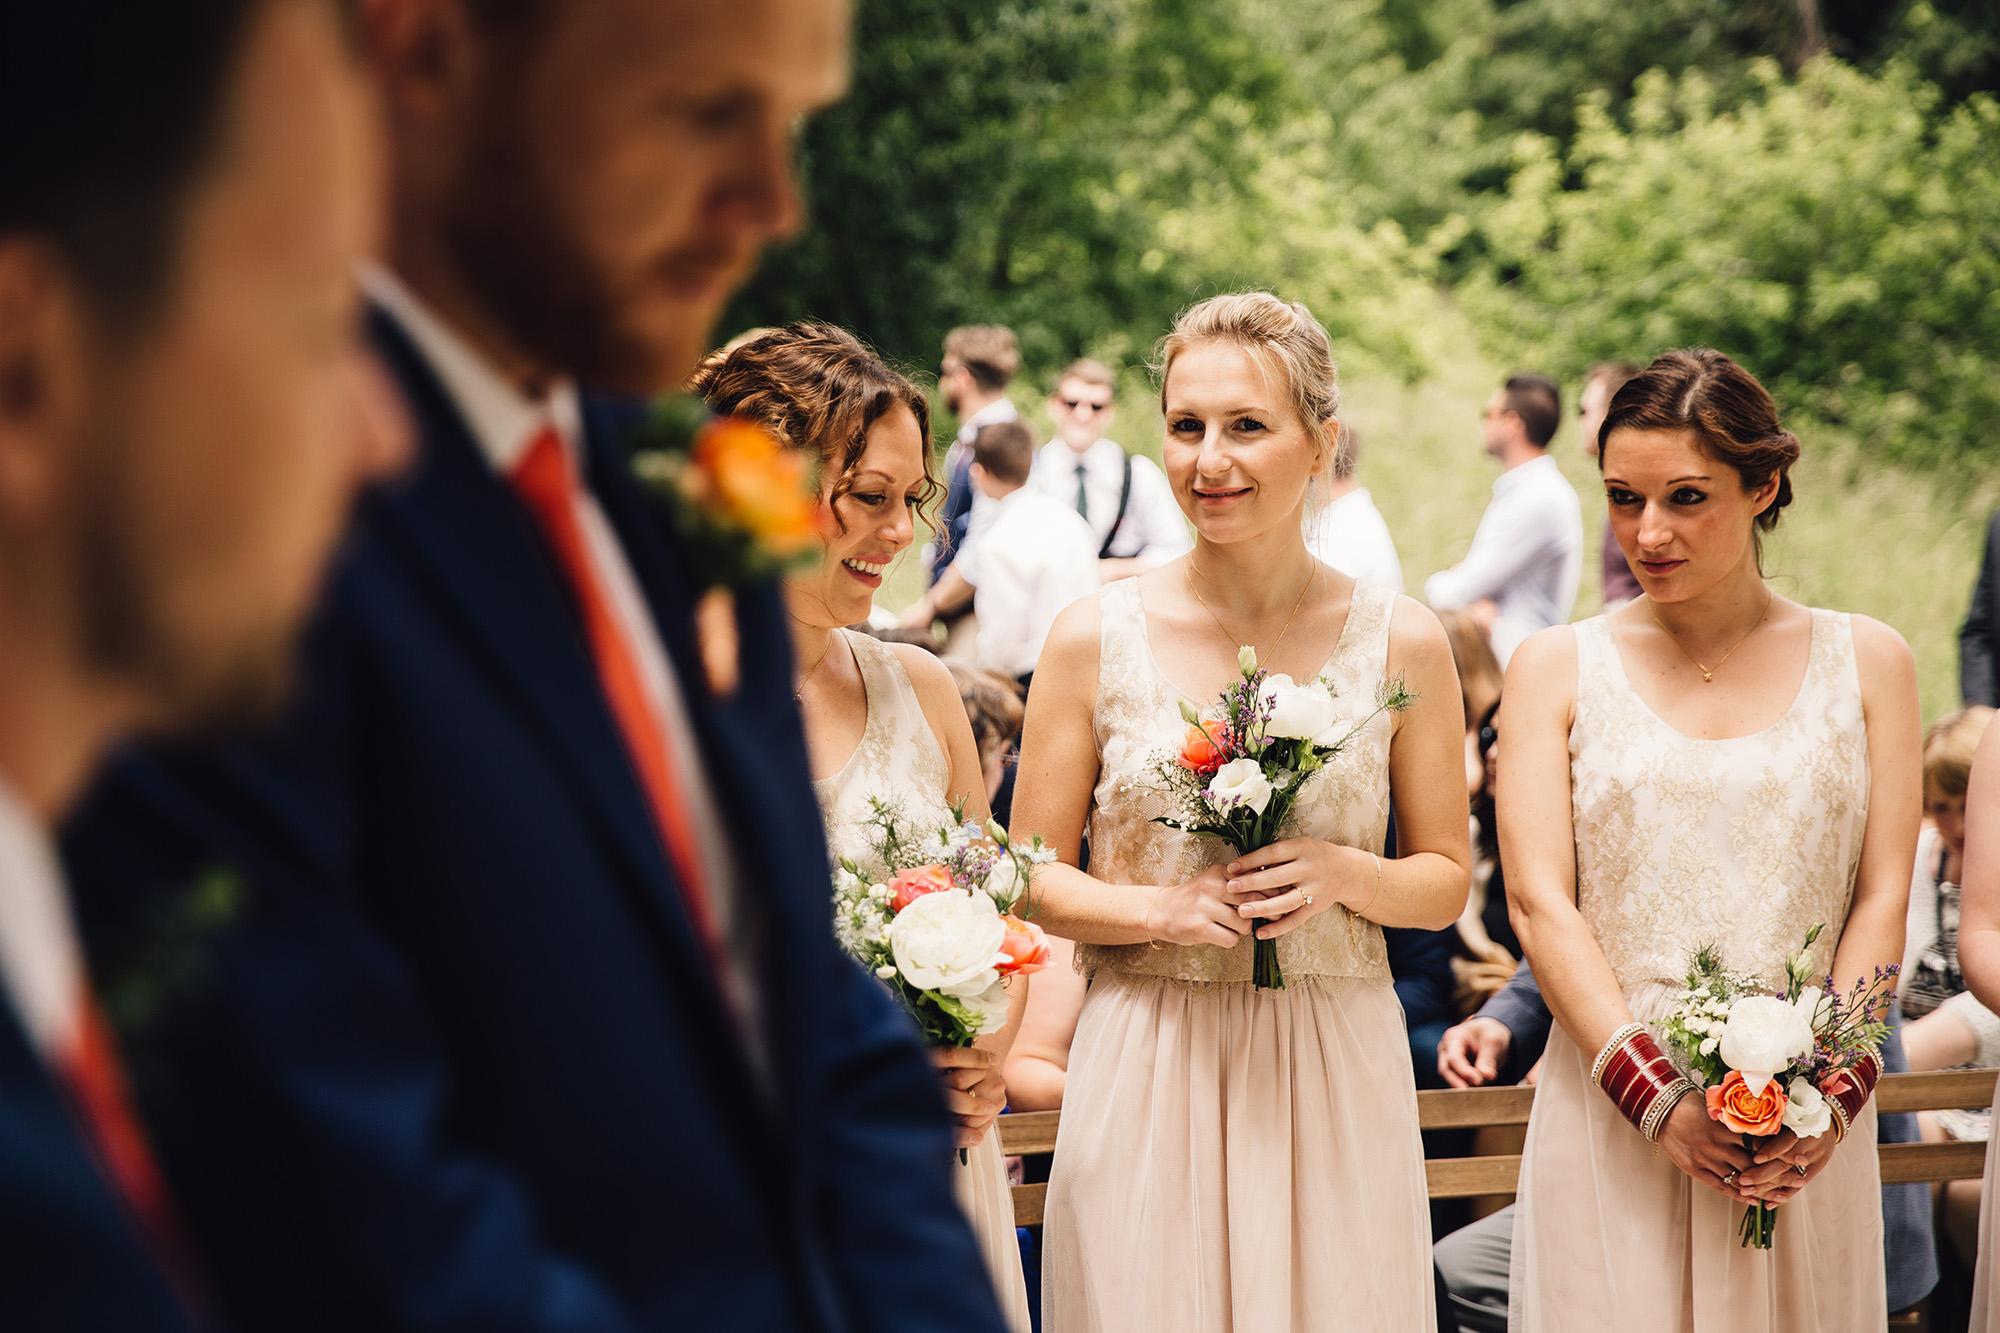 Hannah-Bespoke-Bridesmaids-Bohemian-French-Wedding-Gold-Lace-Susanna-Greening-Designs-Matlock-Derbyshire-12